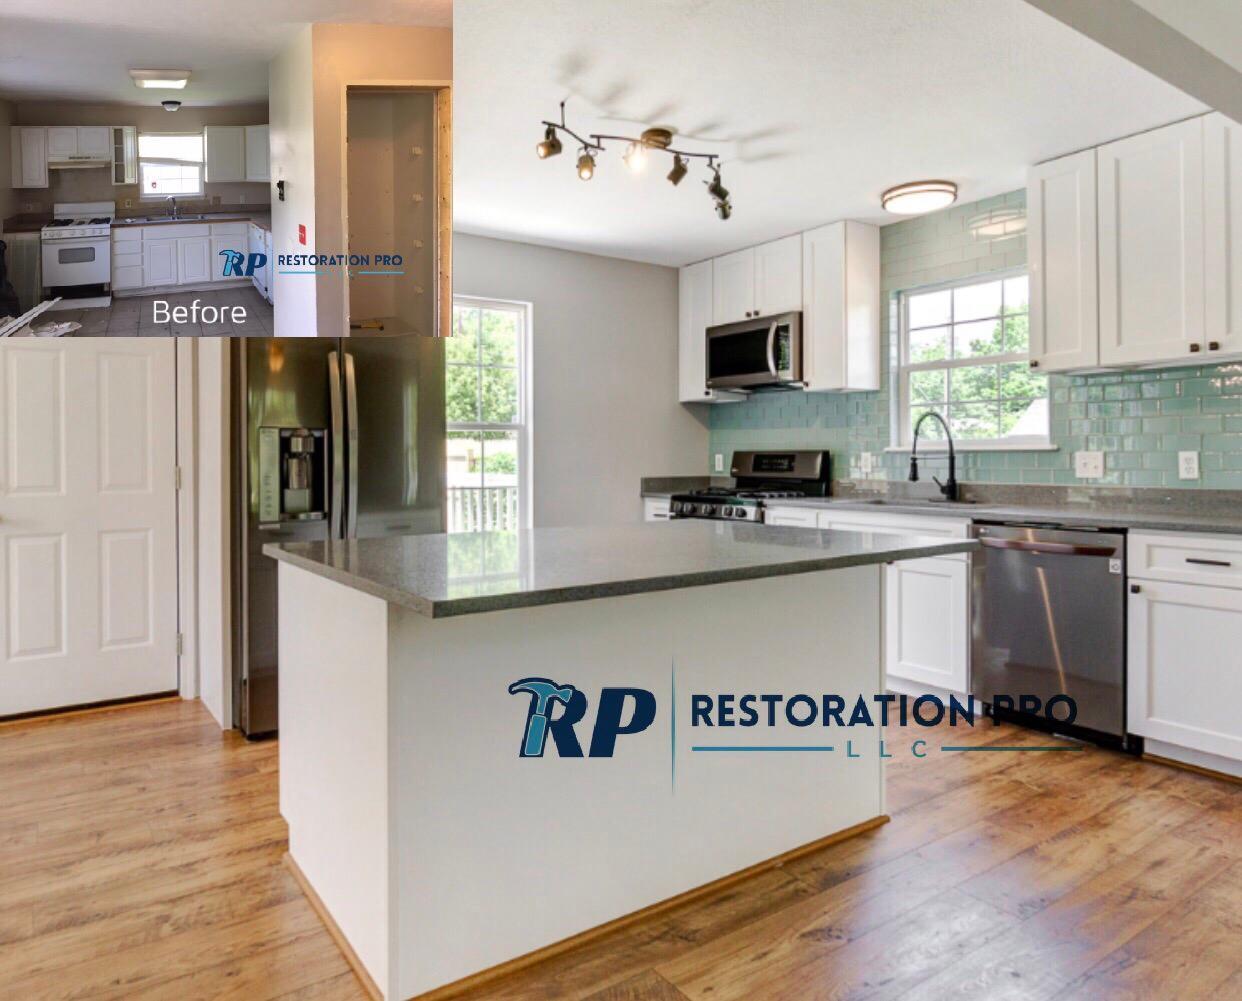 Restoration Pro LLC image 8